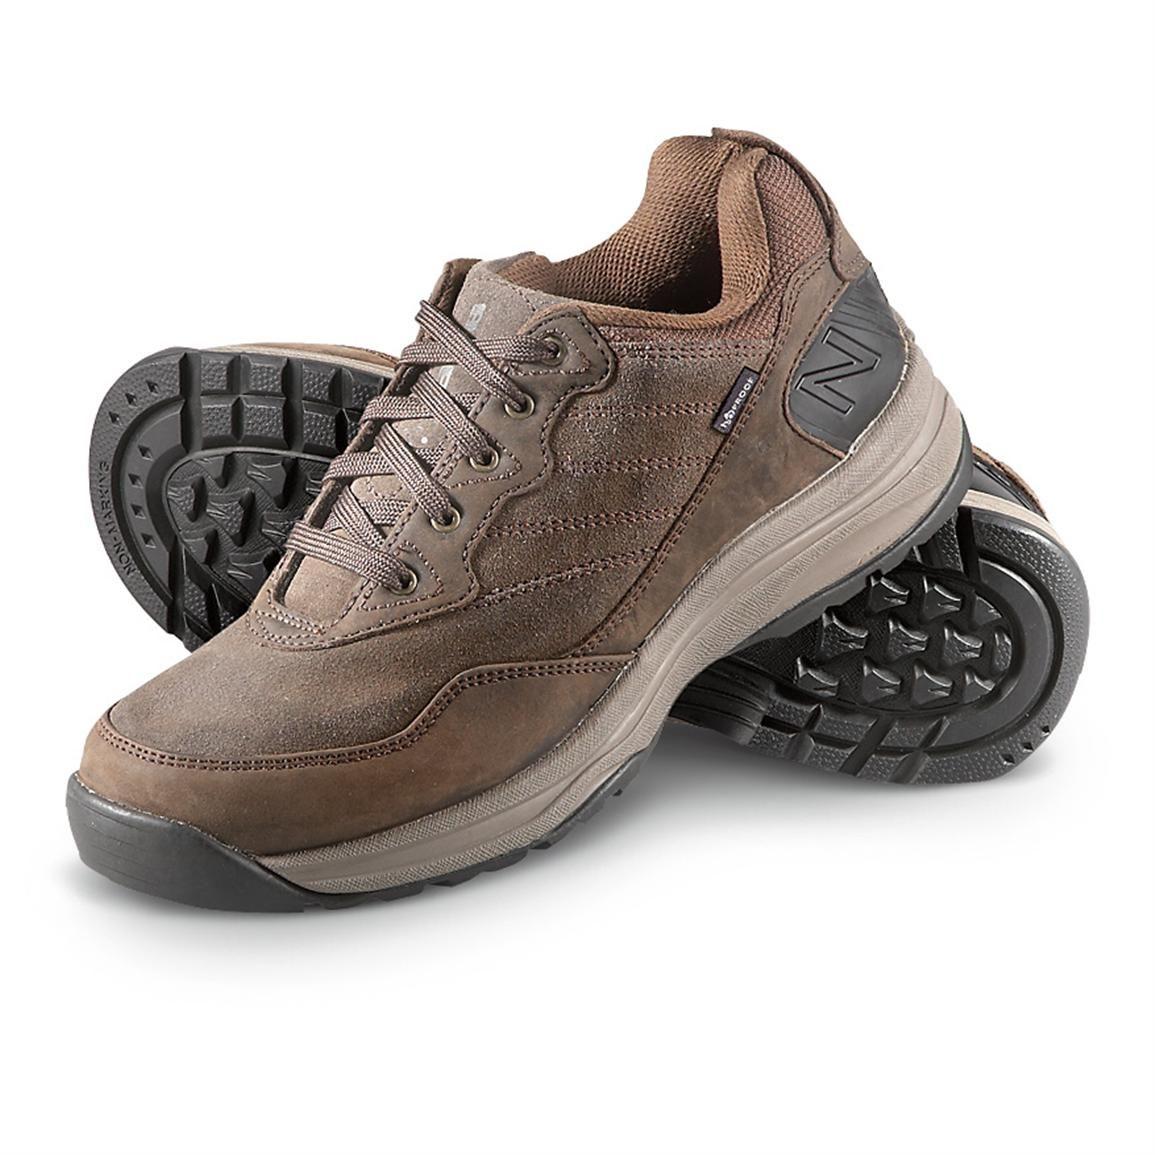 en's New Balance® 968 Country Walking Shoes, Brown | Walking Shoes ...